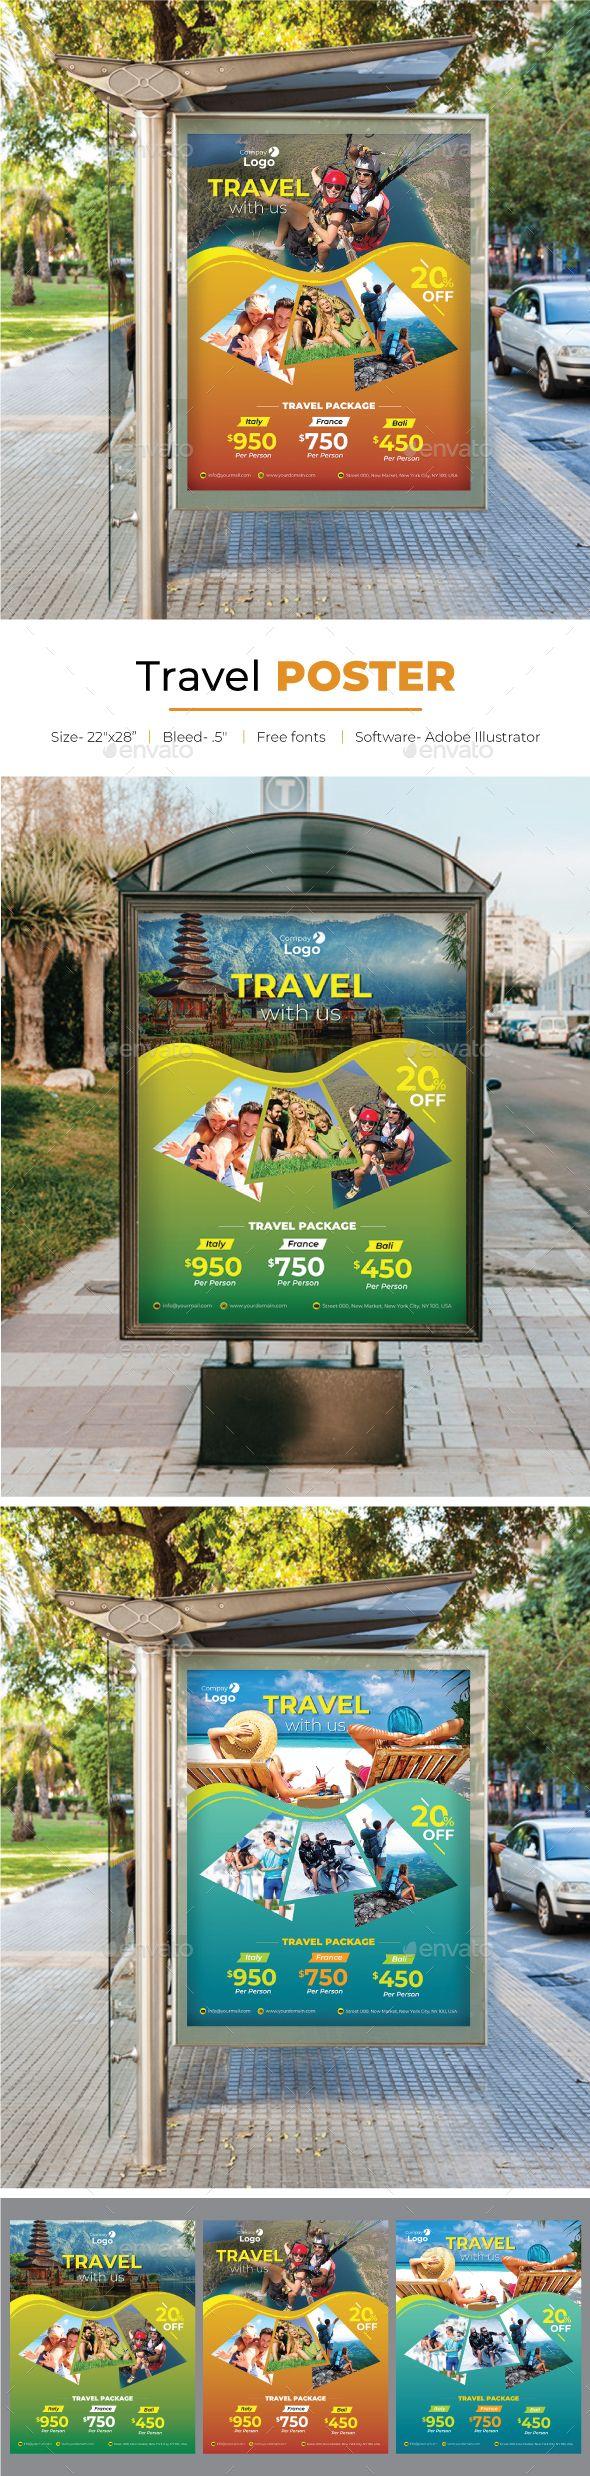 Travel Poster Template Vector EPS, AI Illustrator